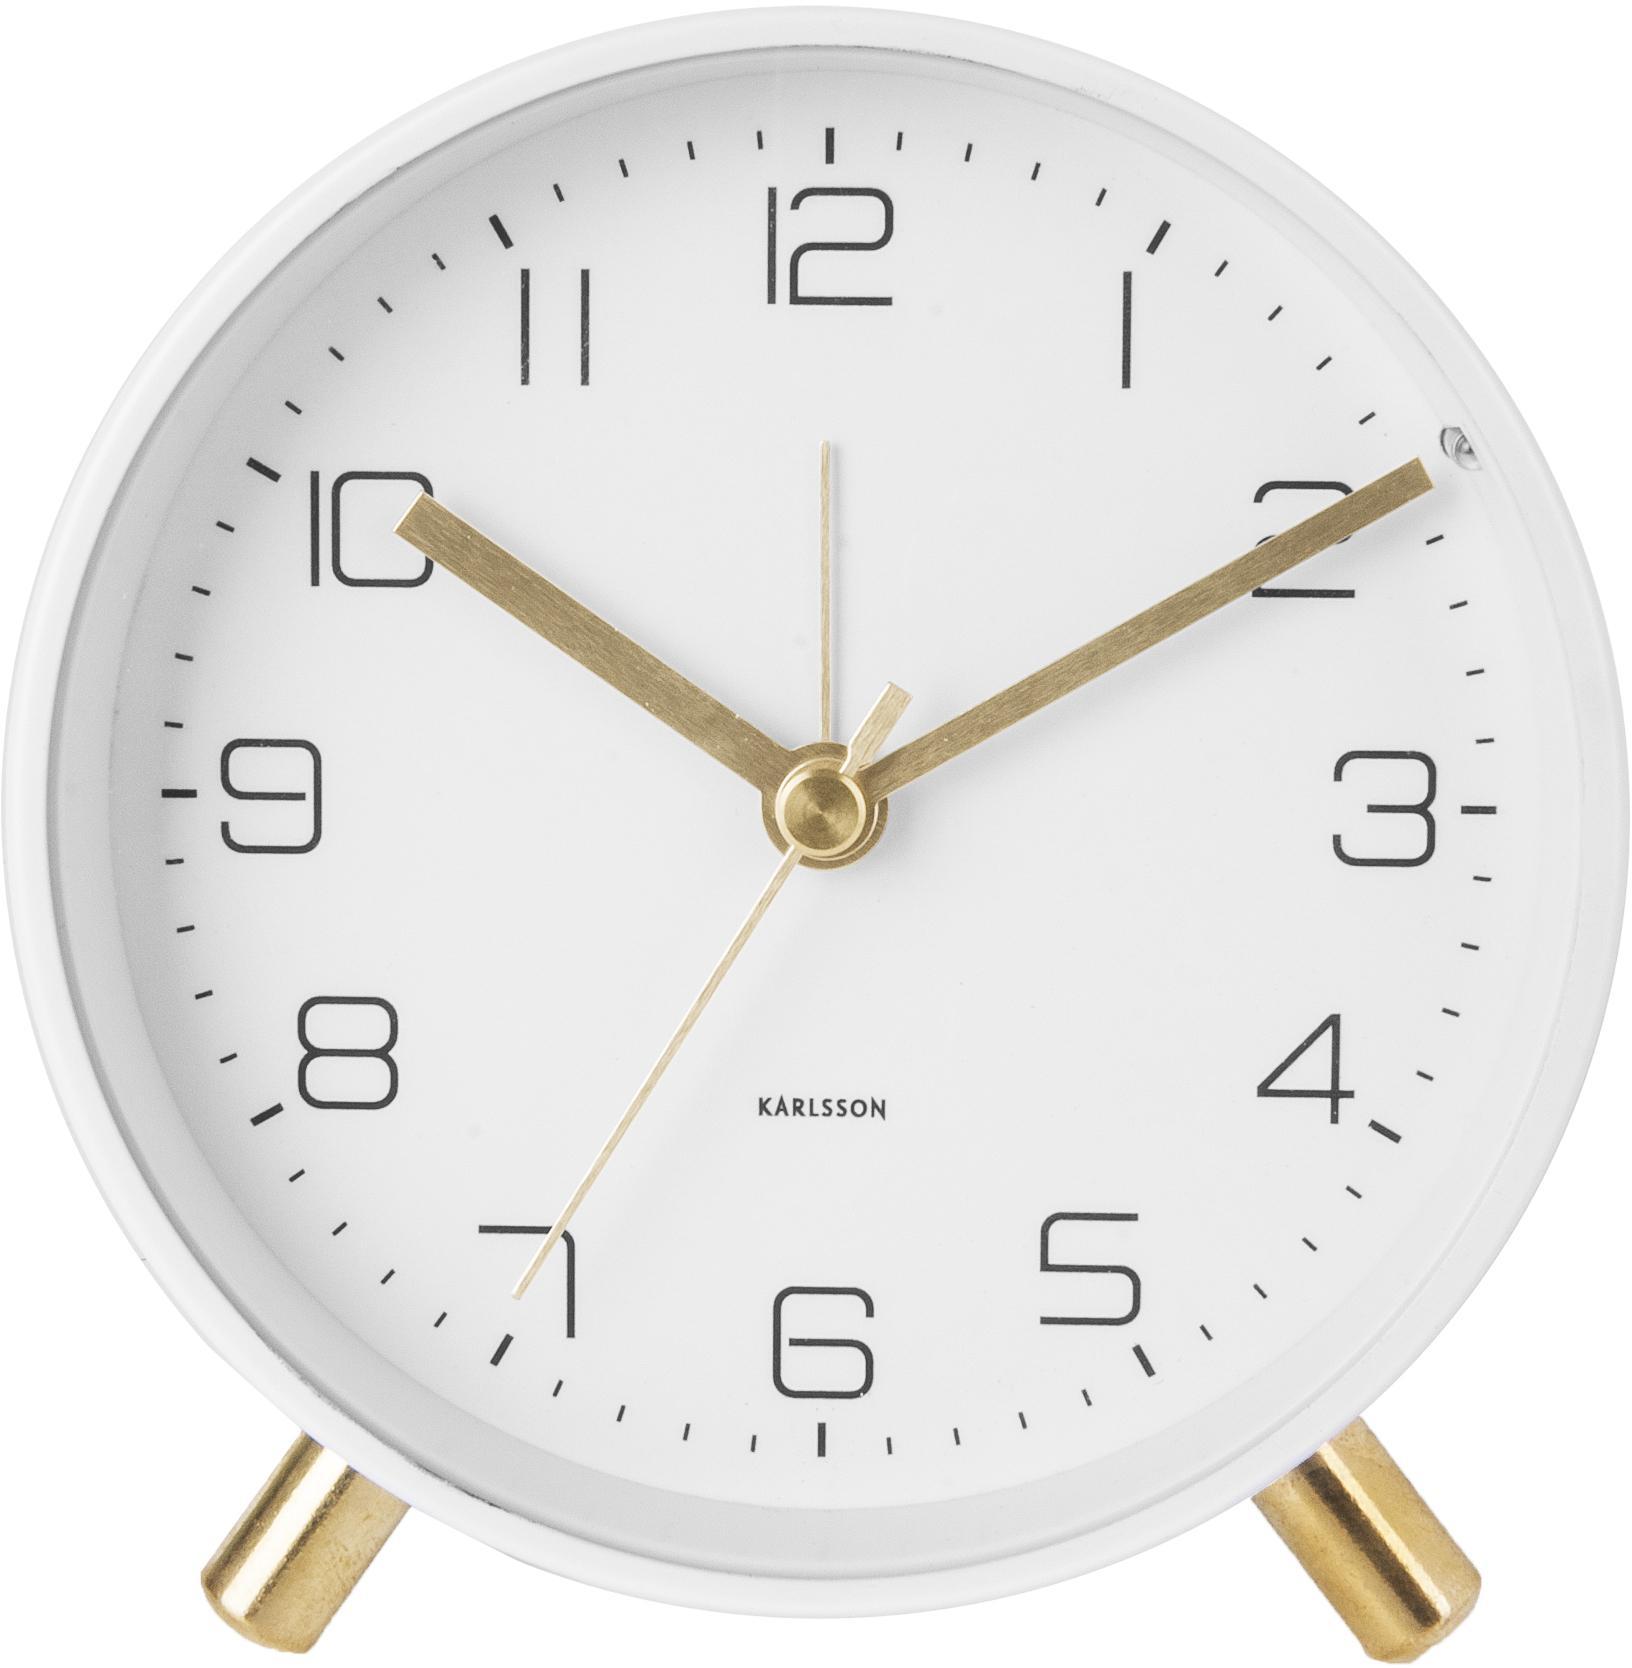 Sveglia Lofty, Metallo verniciato, Bianco, Ø 11 x Prof. 5 cm